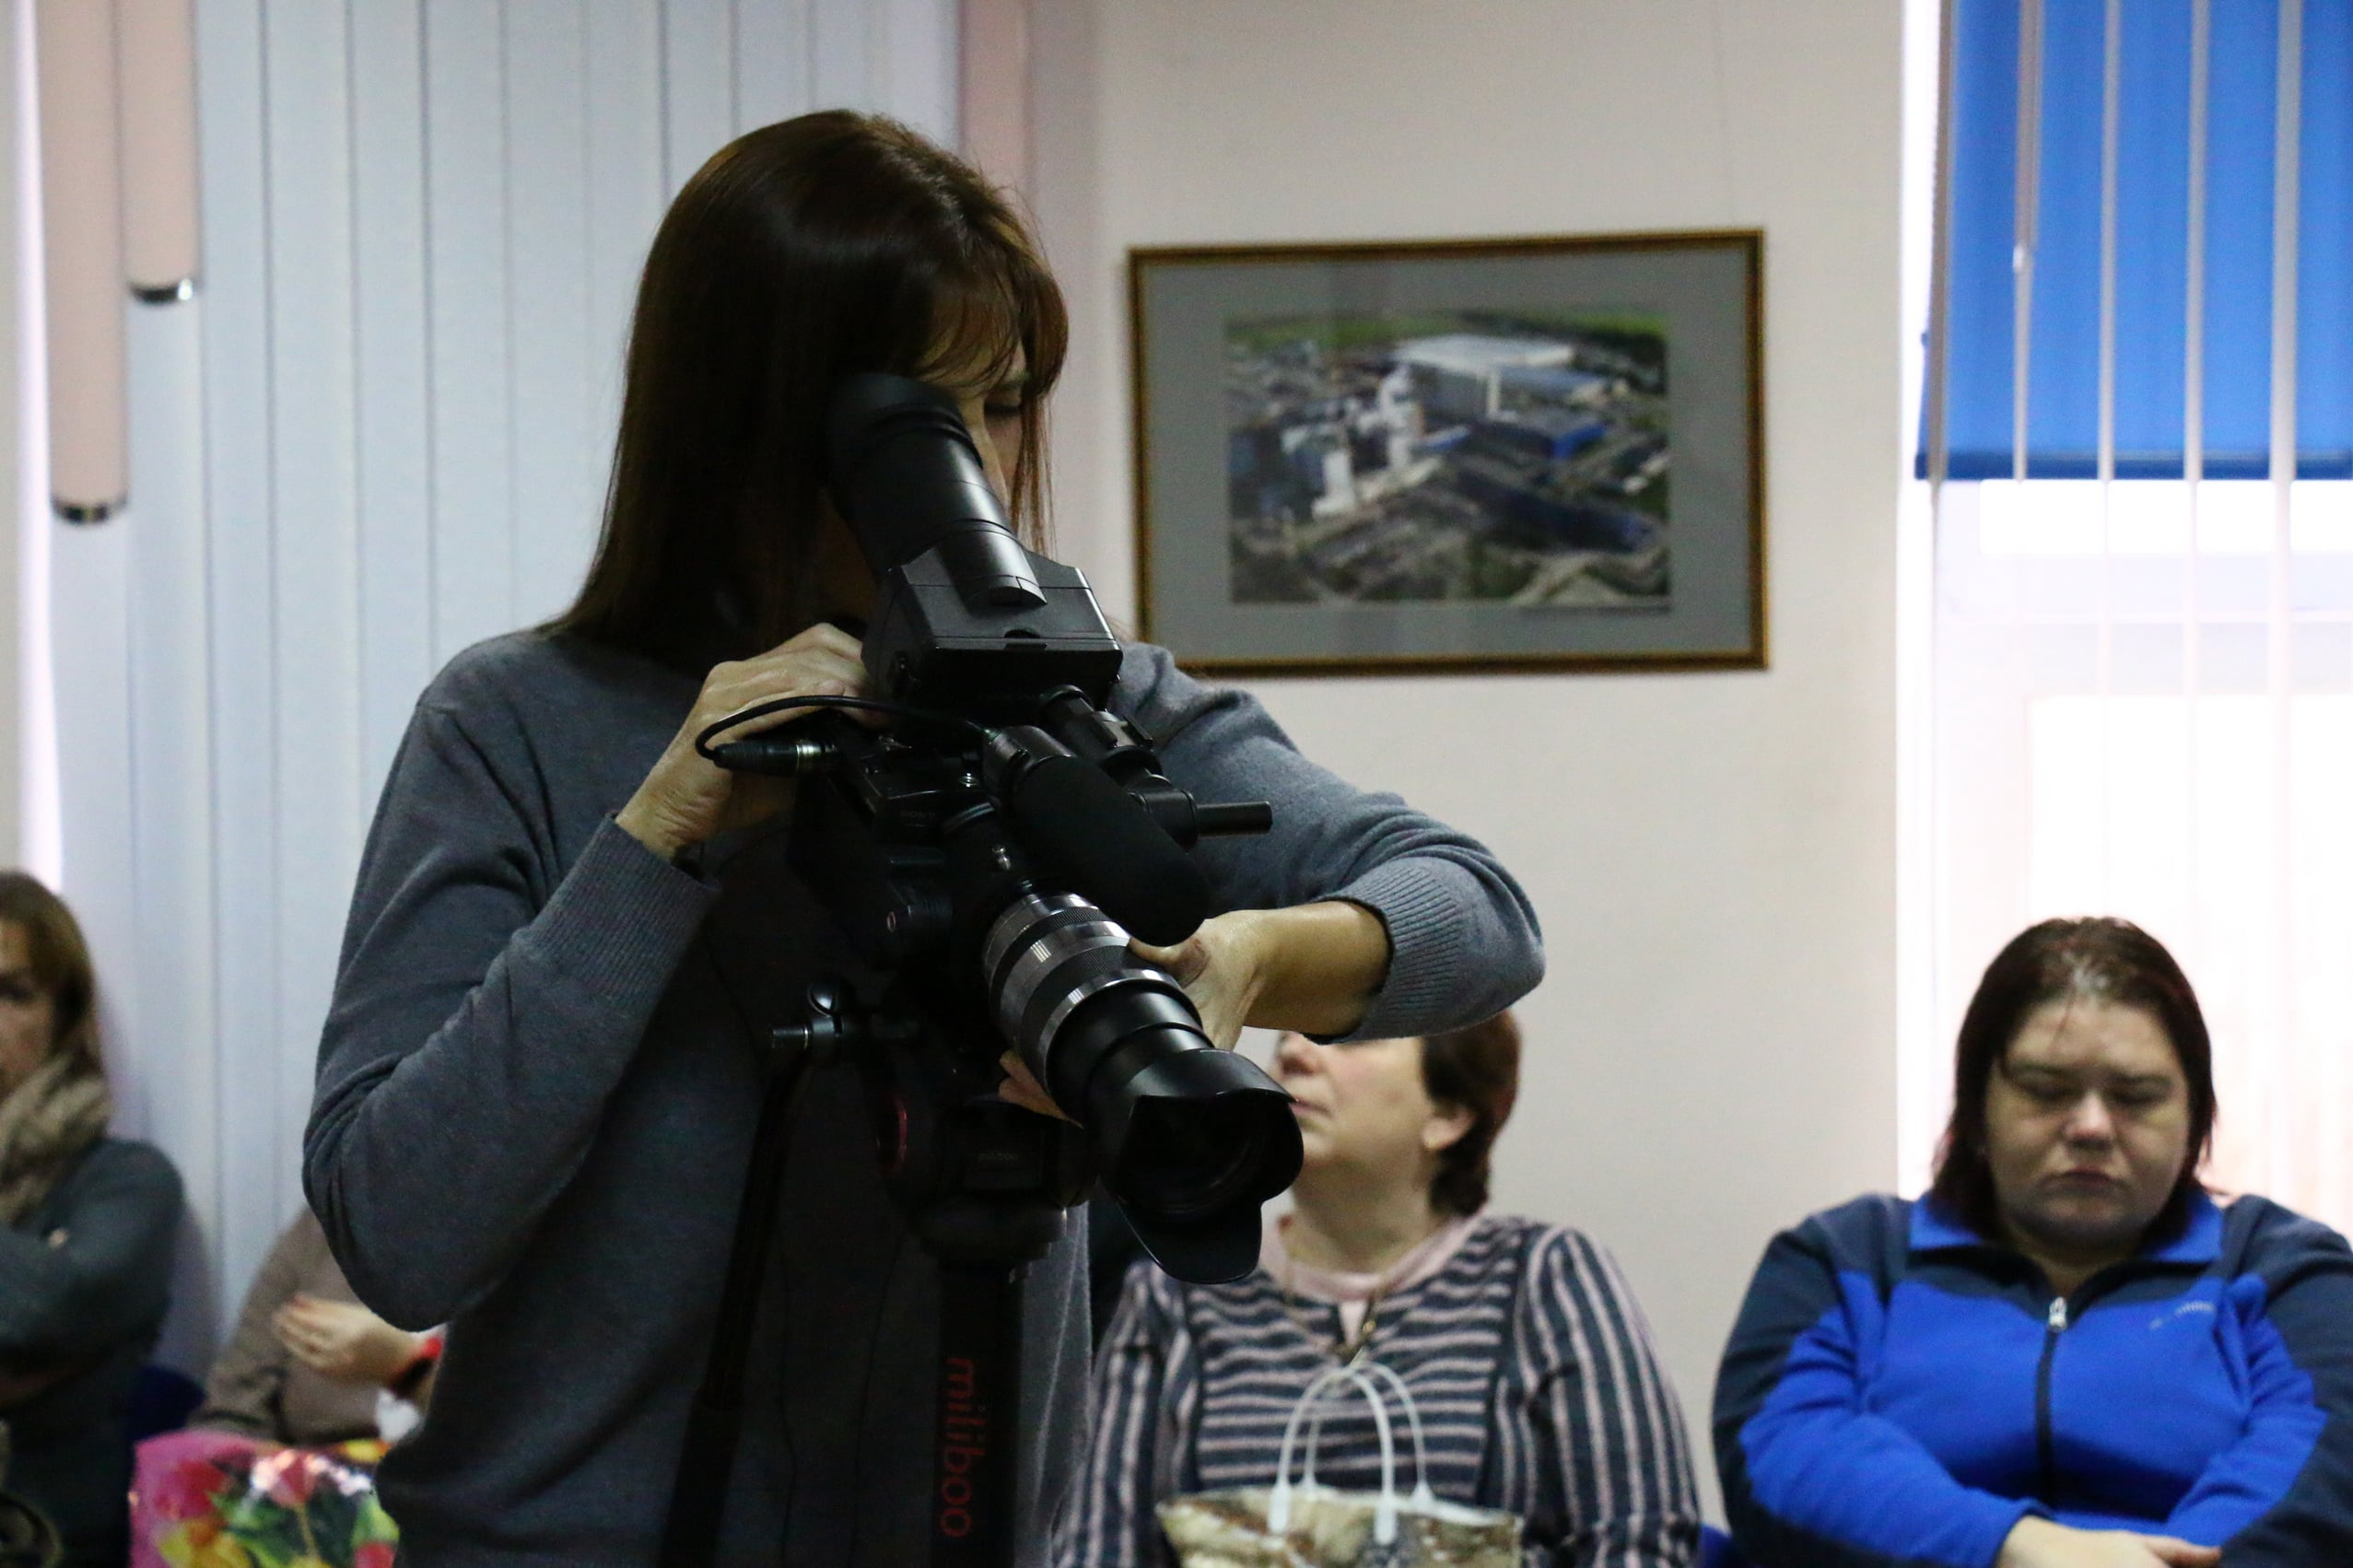 http://monuspen.ru/photoreports/06f1f0951a3799a9c804c7f0881a7685.JPG